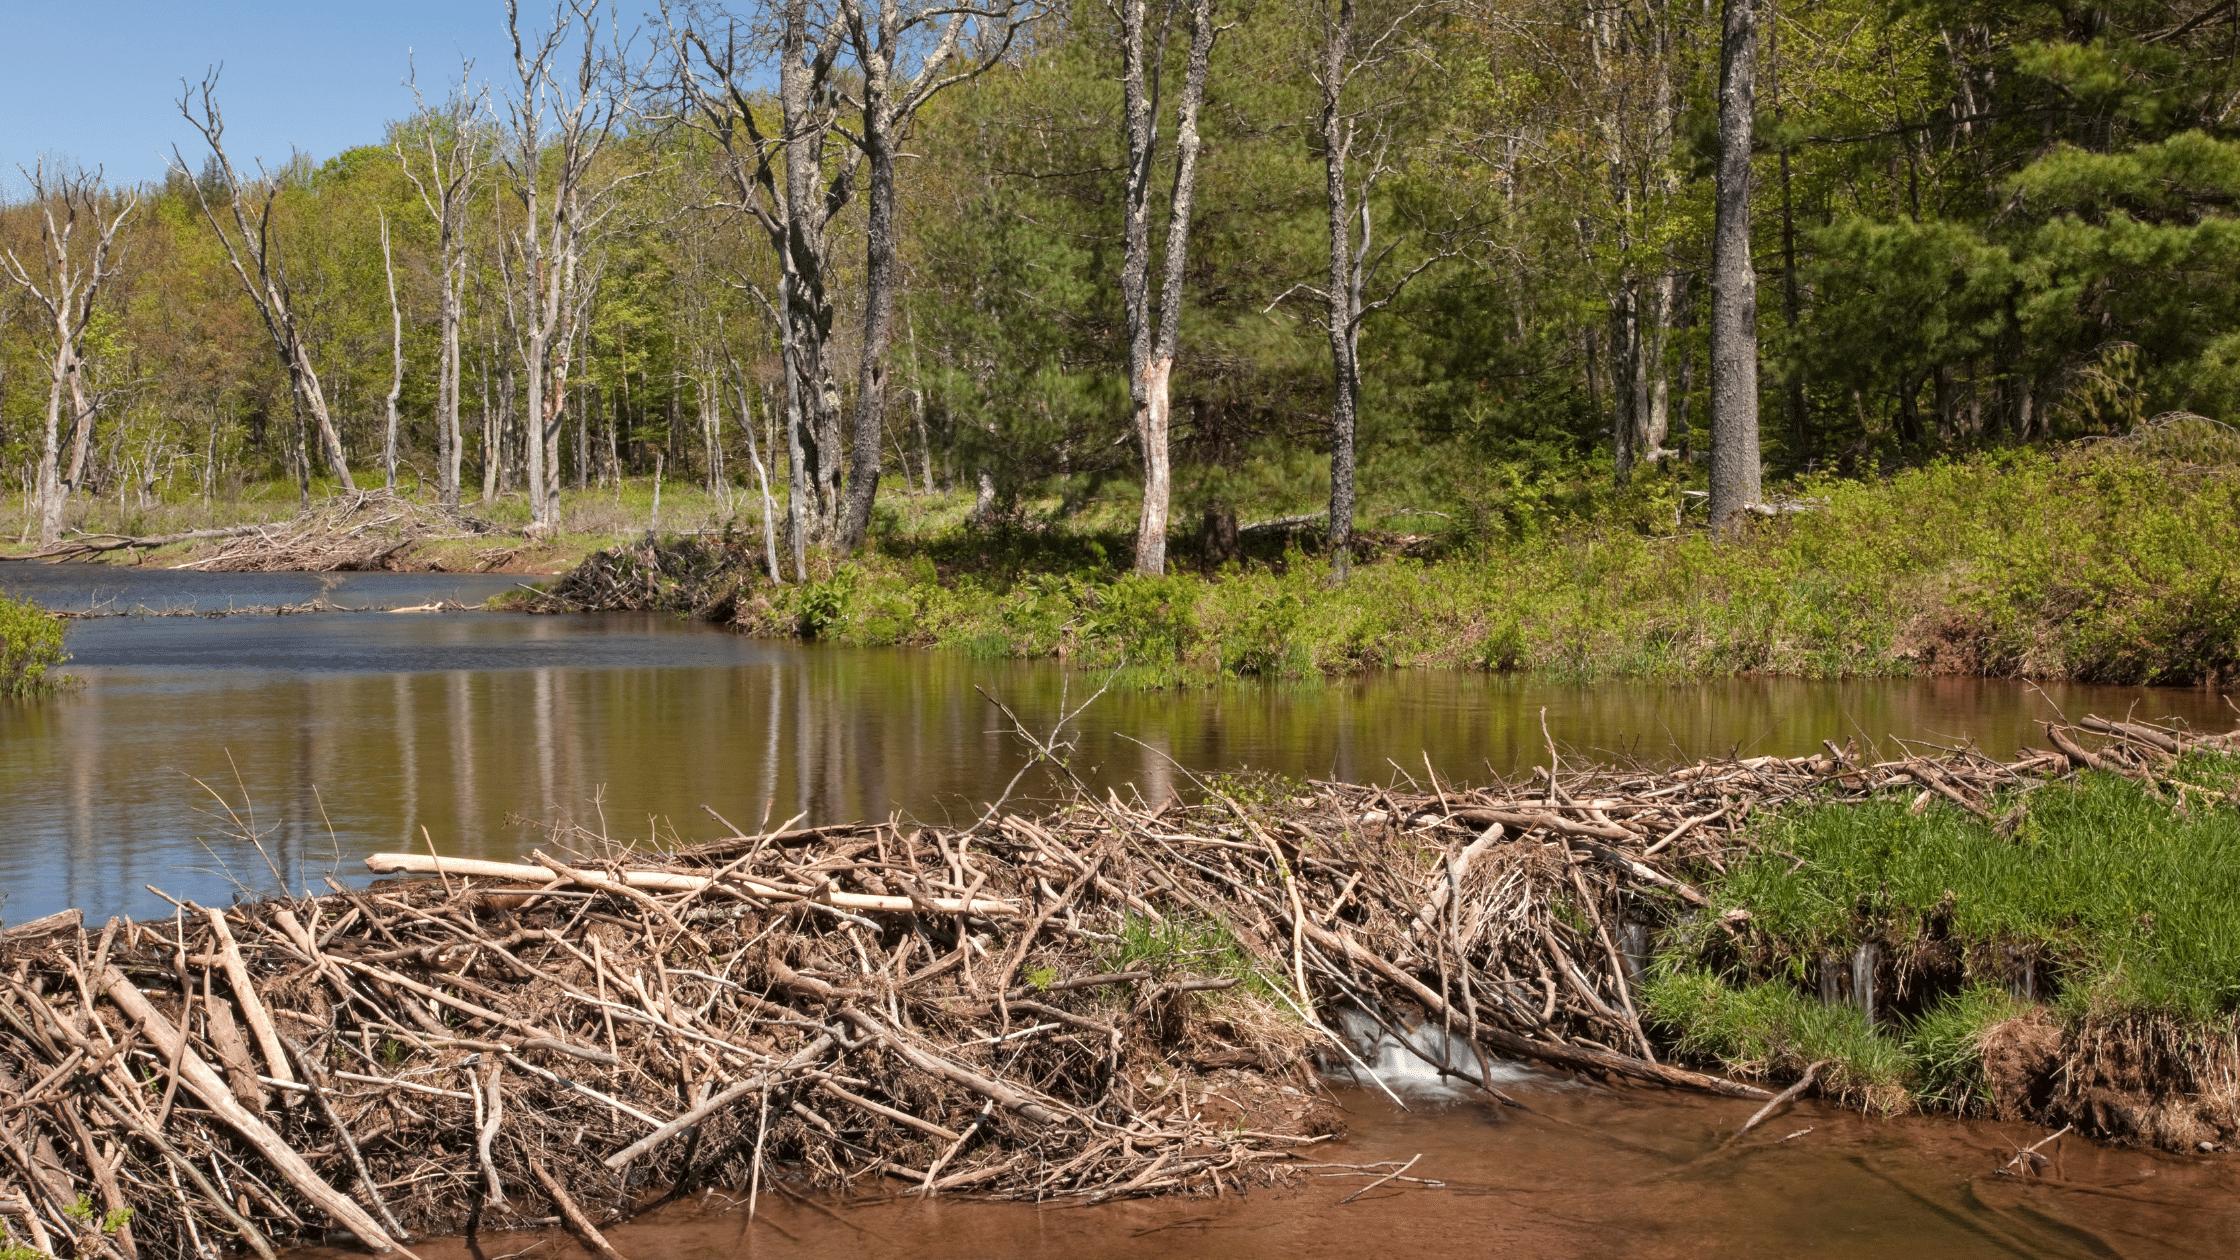 A beavers' dam across a lake